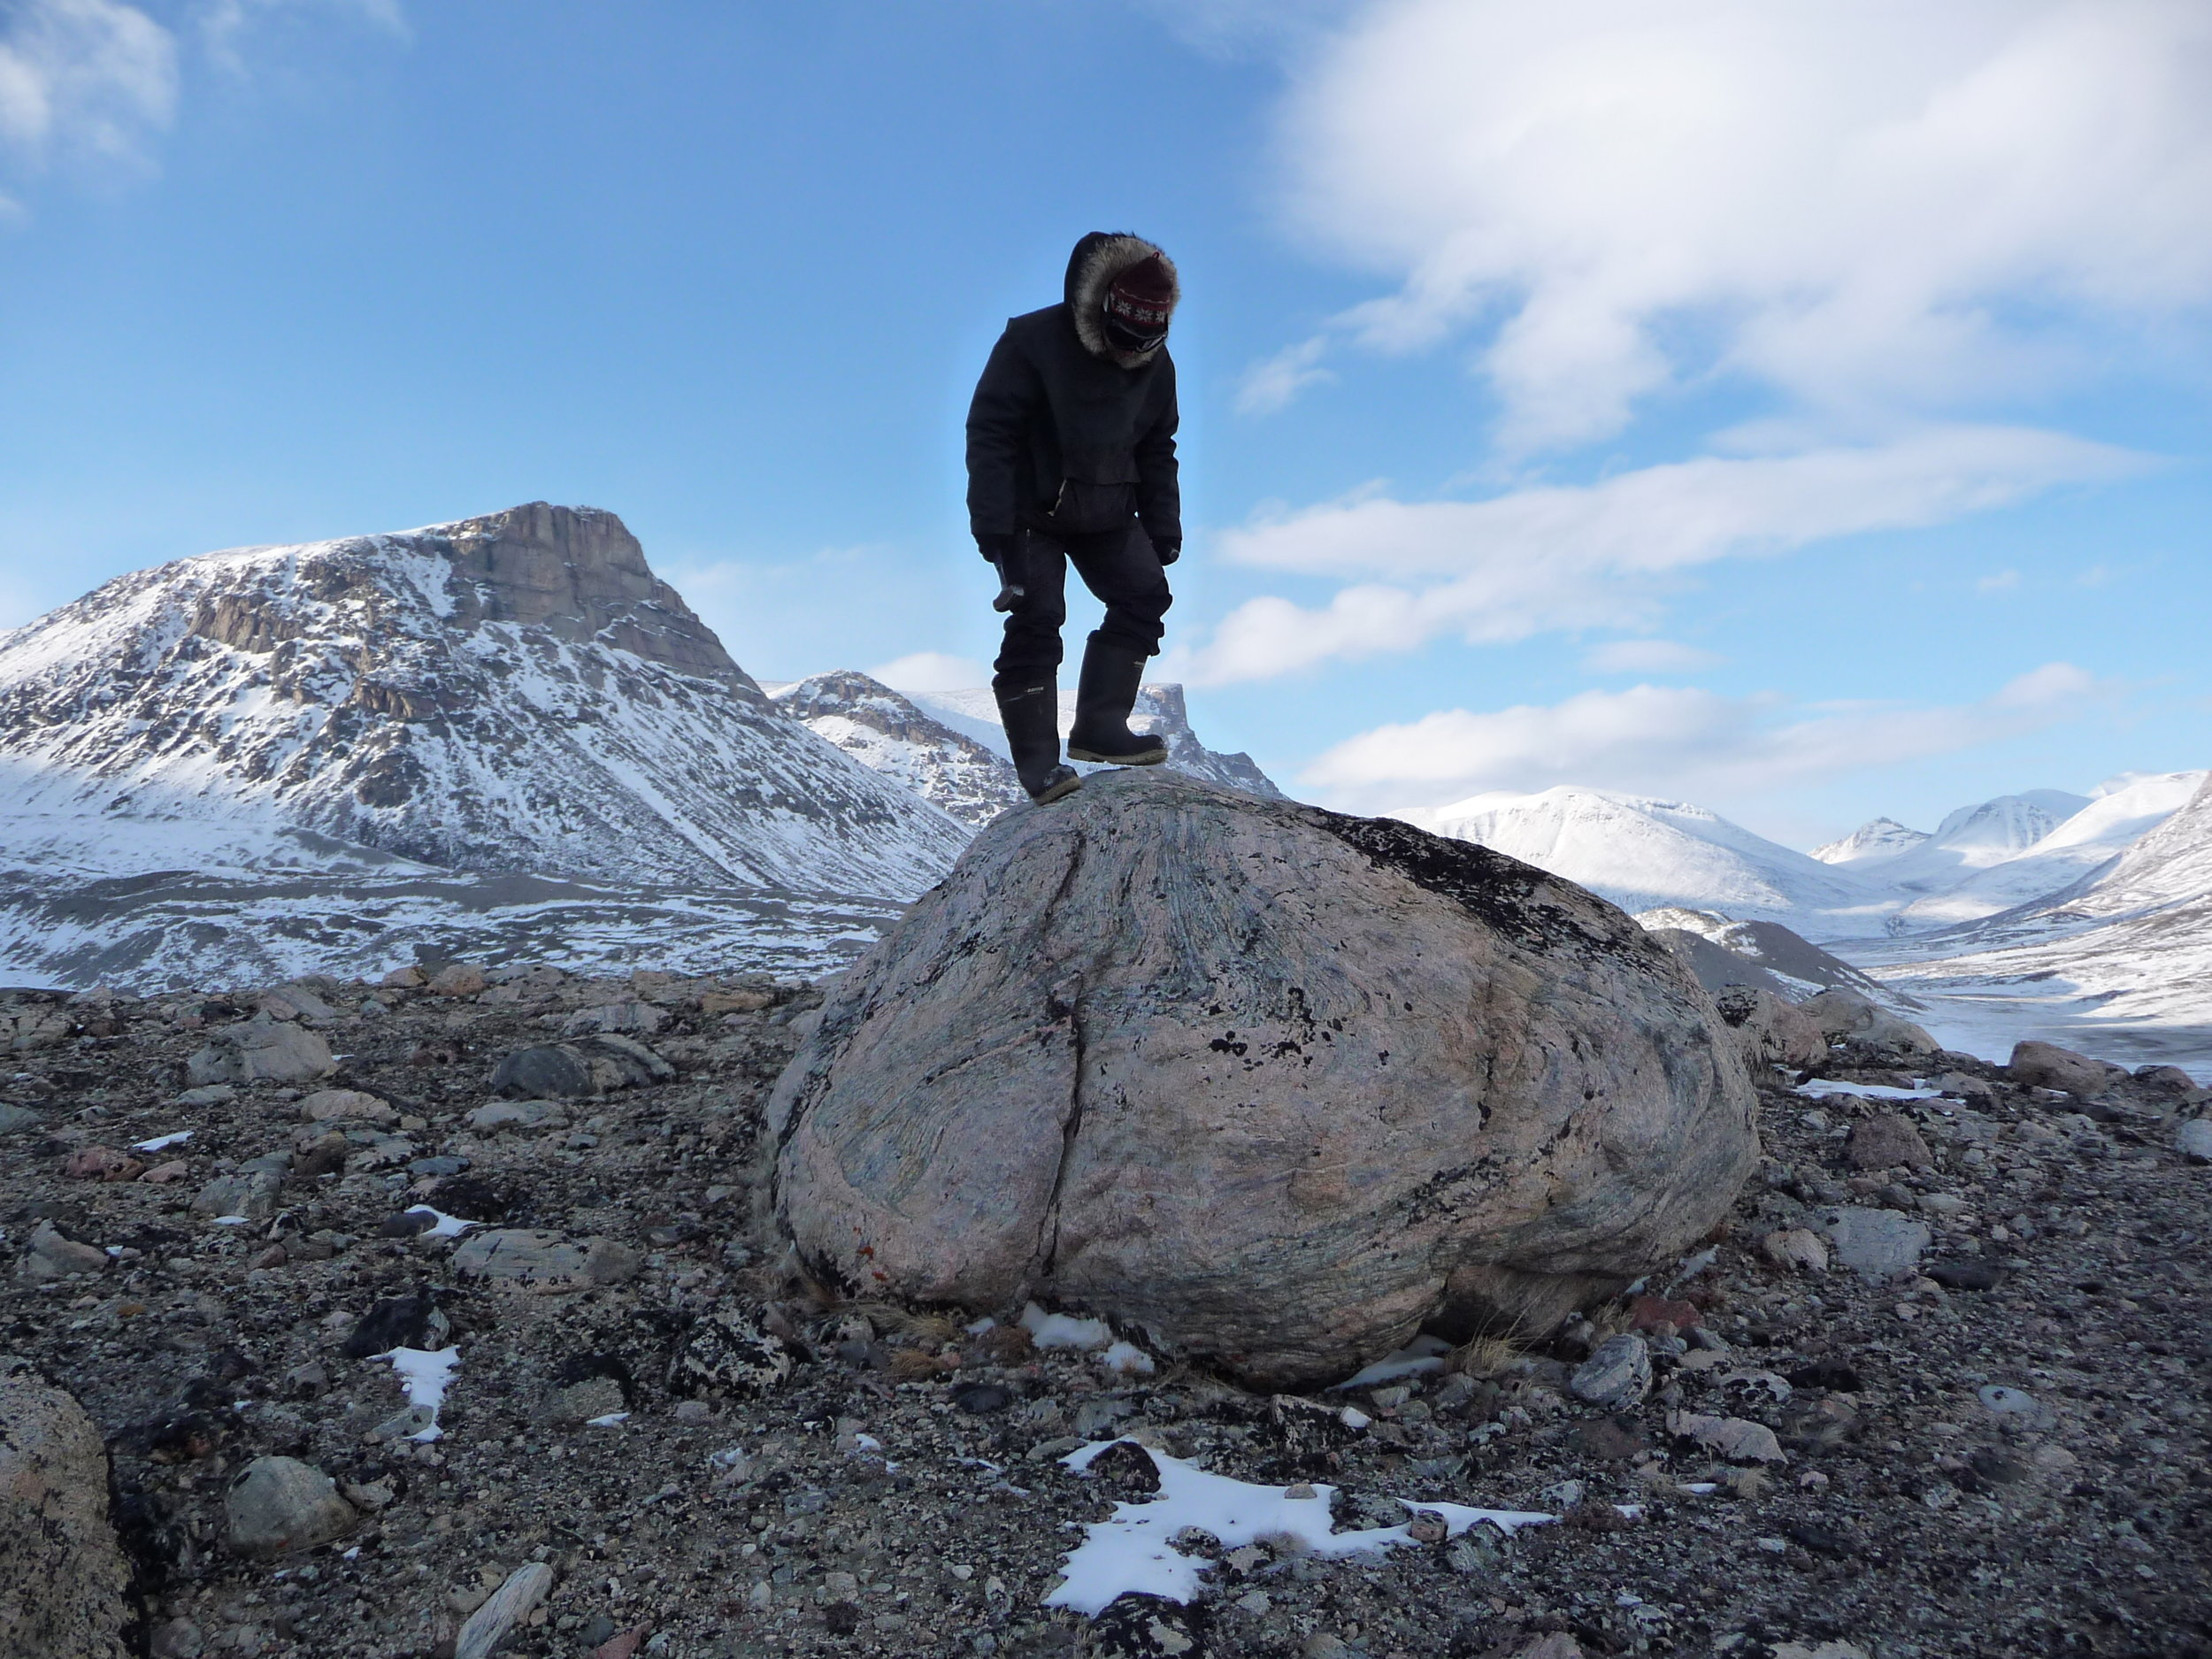 Jason Briner (SUNY Buffalo) sizes up a good looking boulder on Baffin Island before sampling. Photo: Nicolas Young